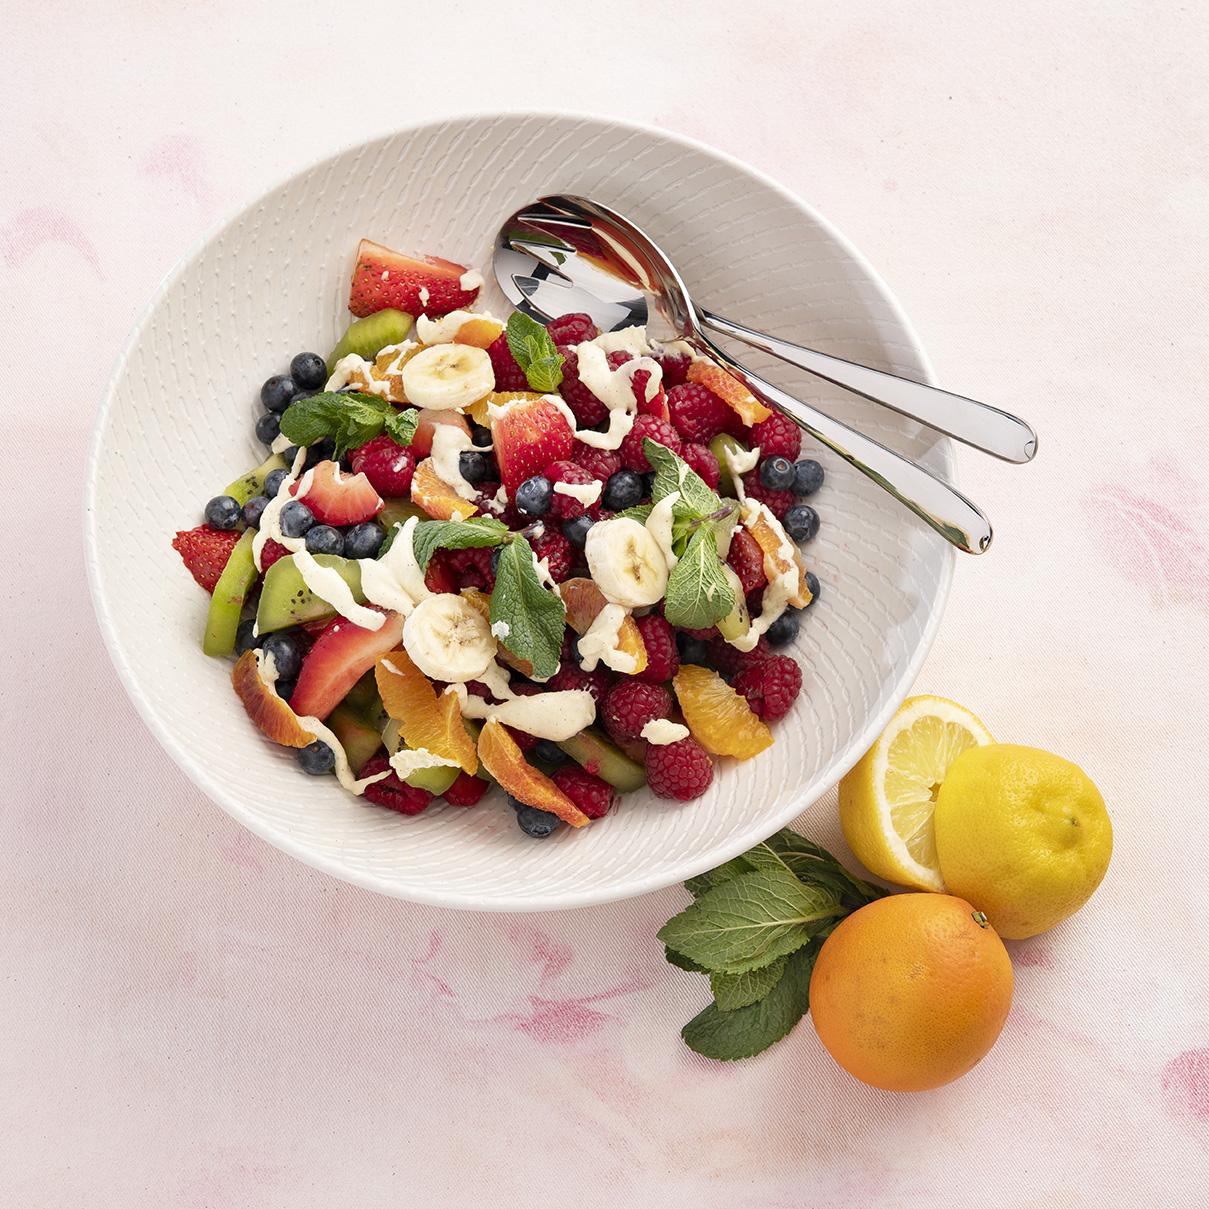 Fruitsalade met Vanille dressing